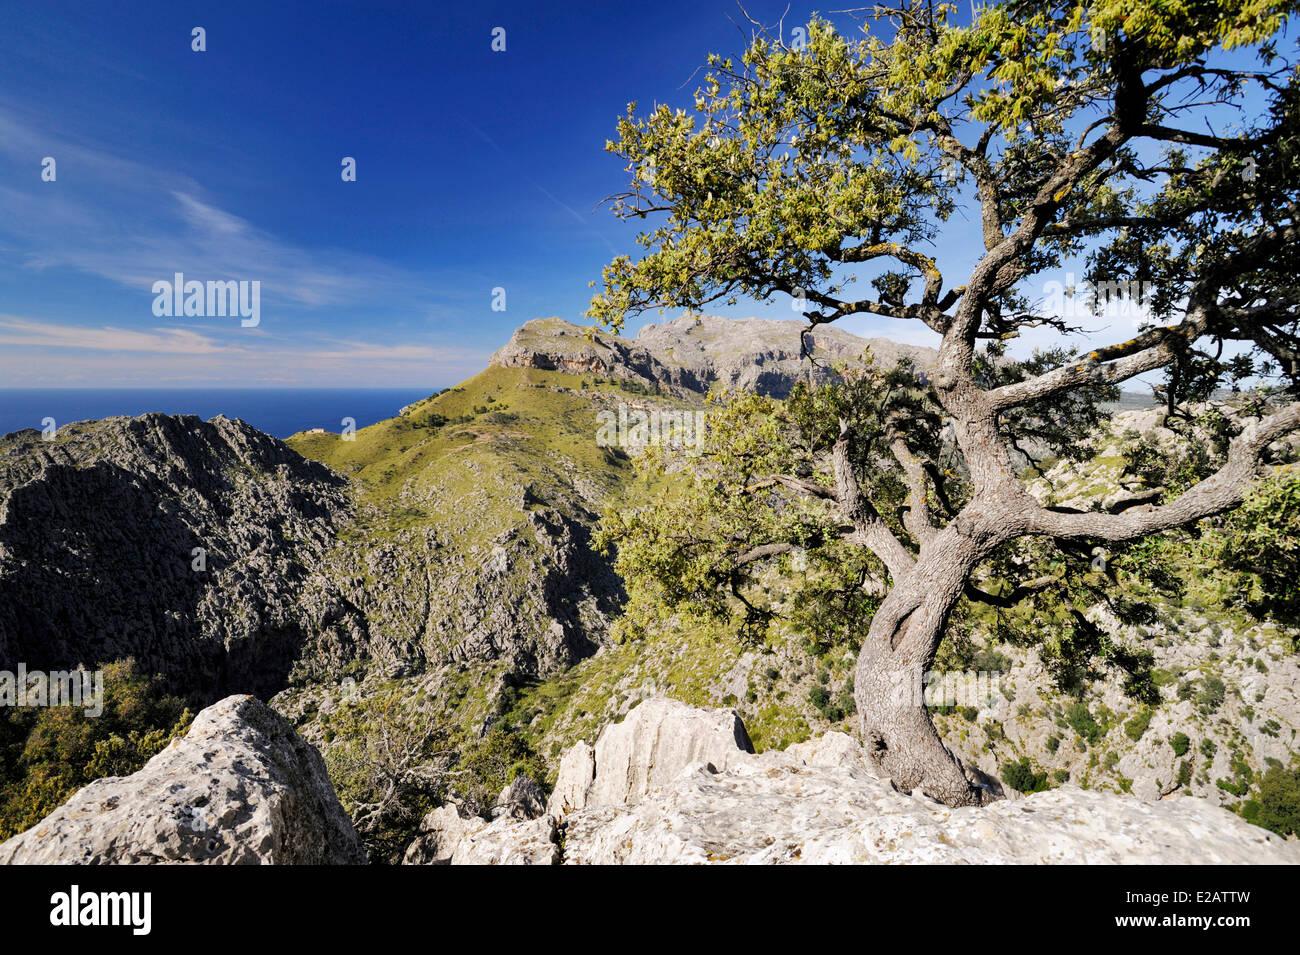 Spain, Balearic Islands, Mallorca, Sa Calobra, landscape of the northwest coast - Stock Image